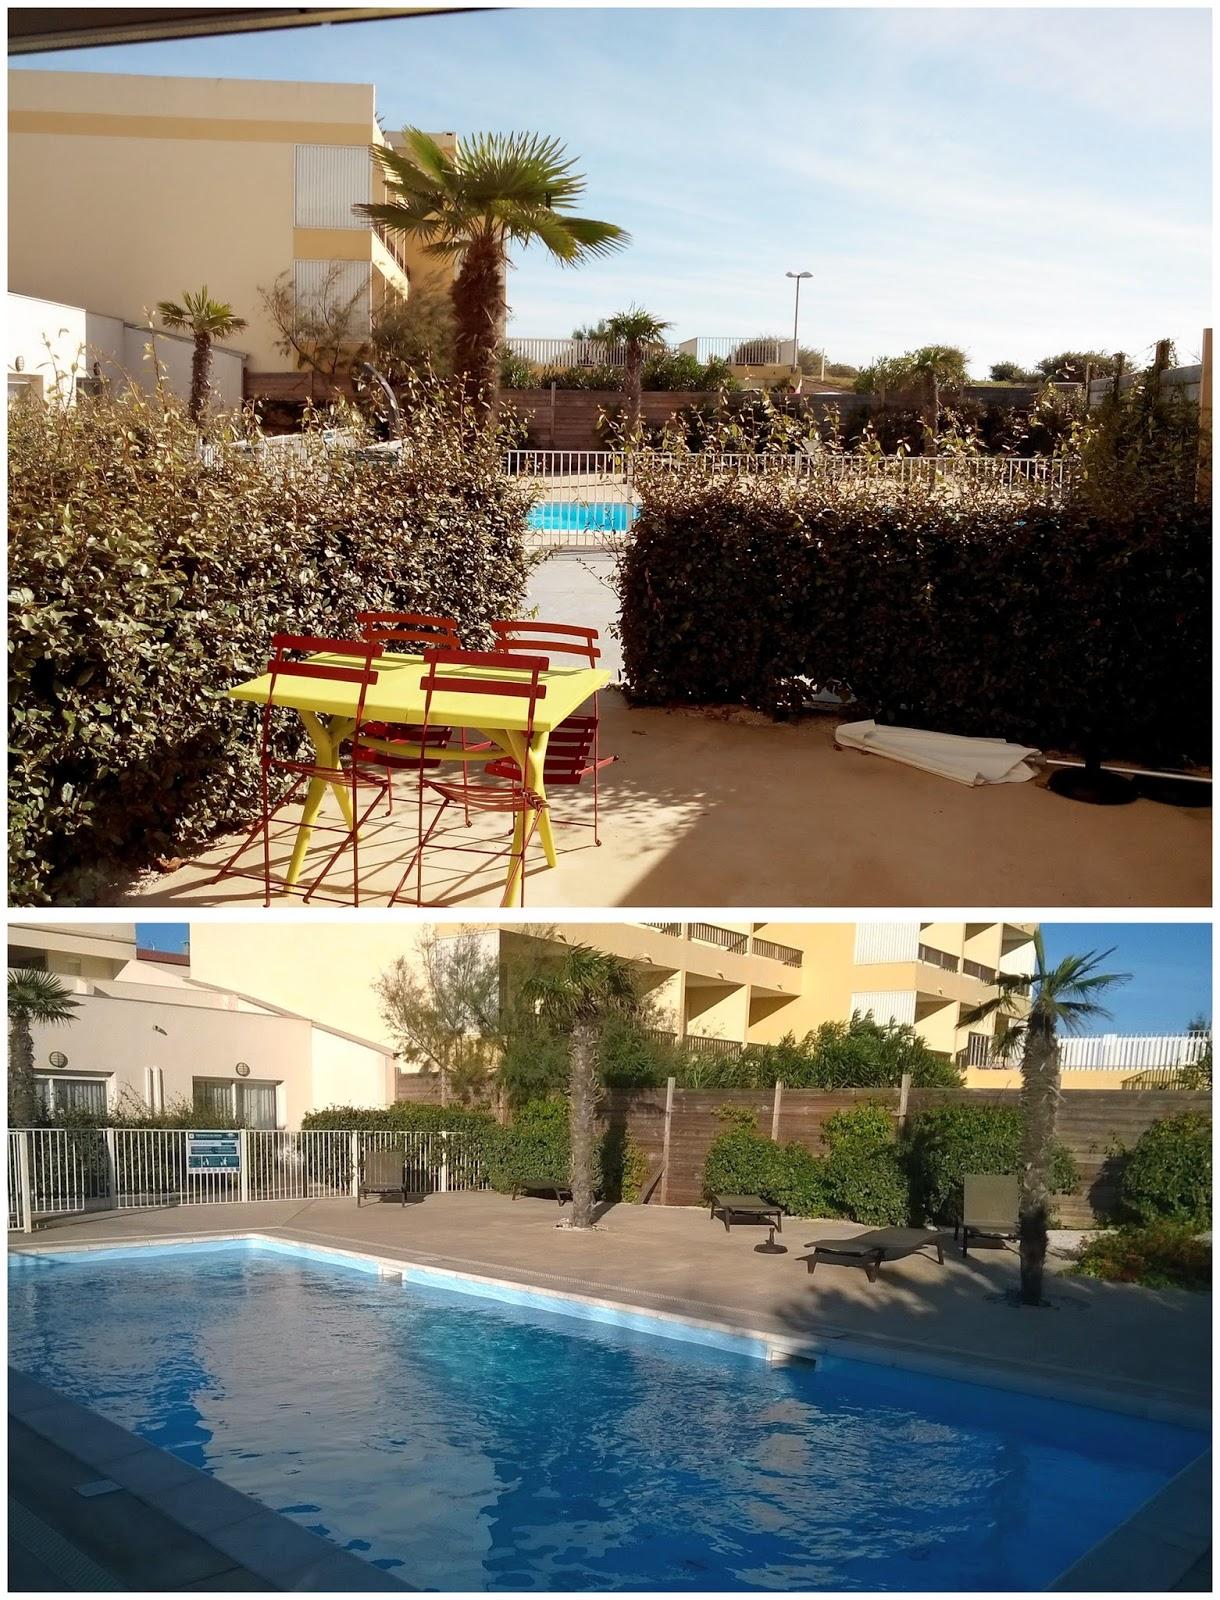 piscine, terrasse, thalacap, cap d'agde, bullelodie